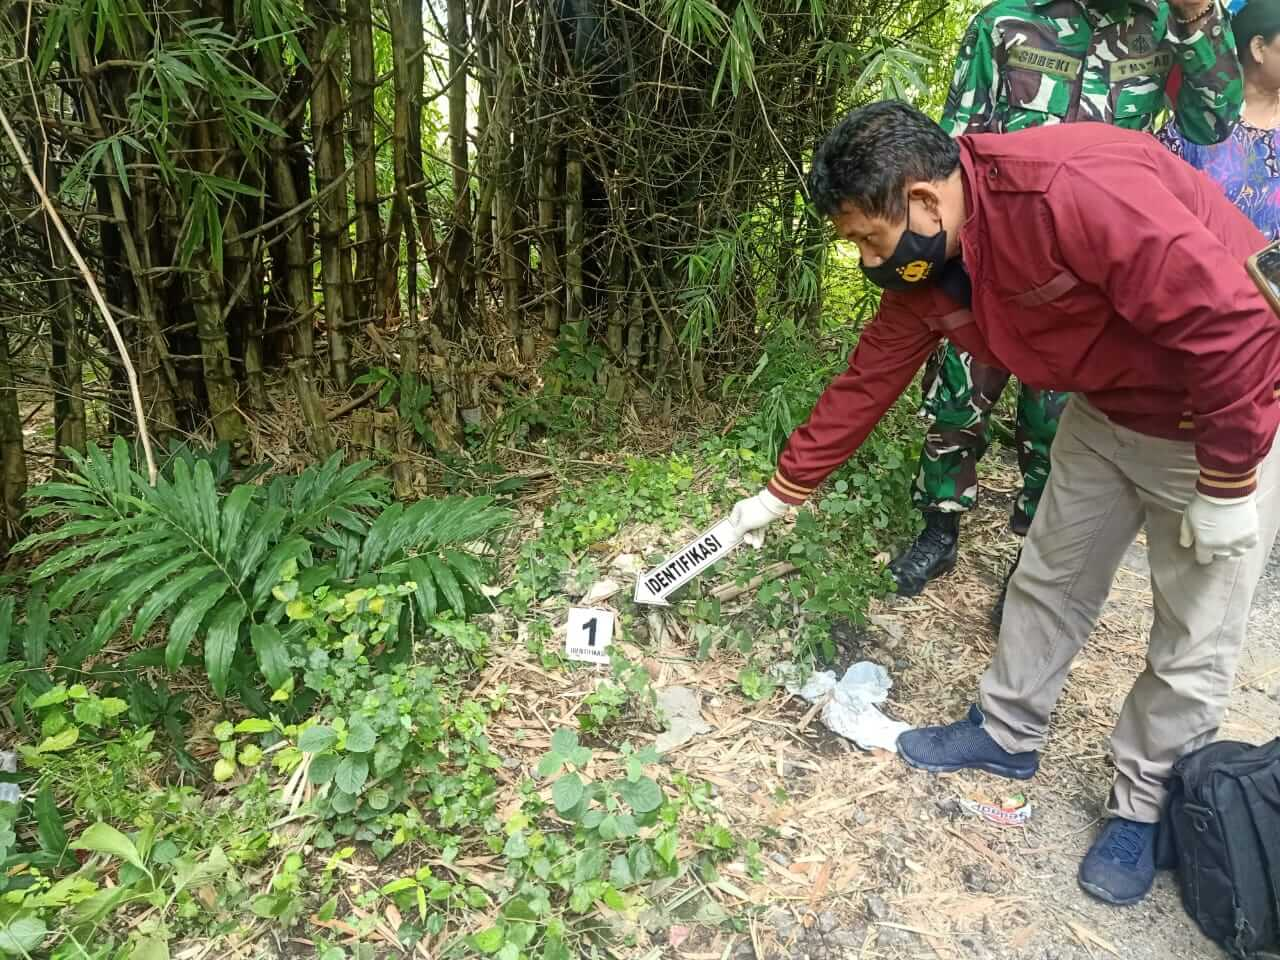 Petugas kepolisian sedang melakukan proses olah TKP di mana bayi perempuan itu ditemukan. (Foto: Humas Polsek Rengel/Tugu Jatim)